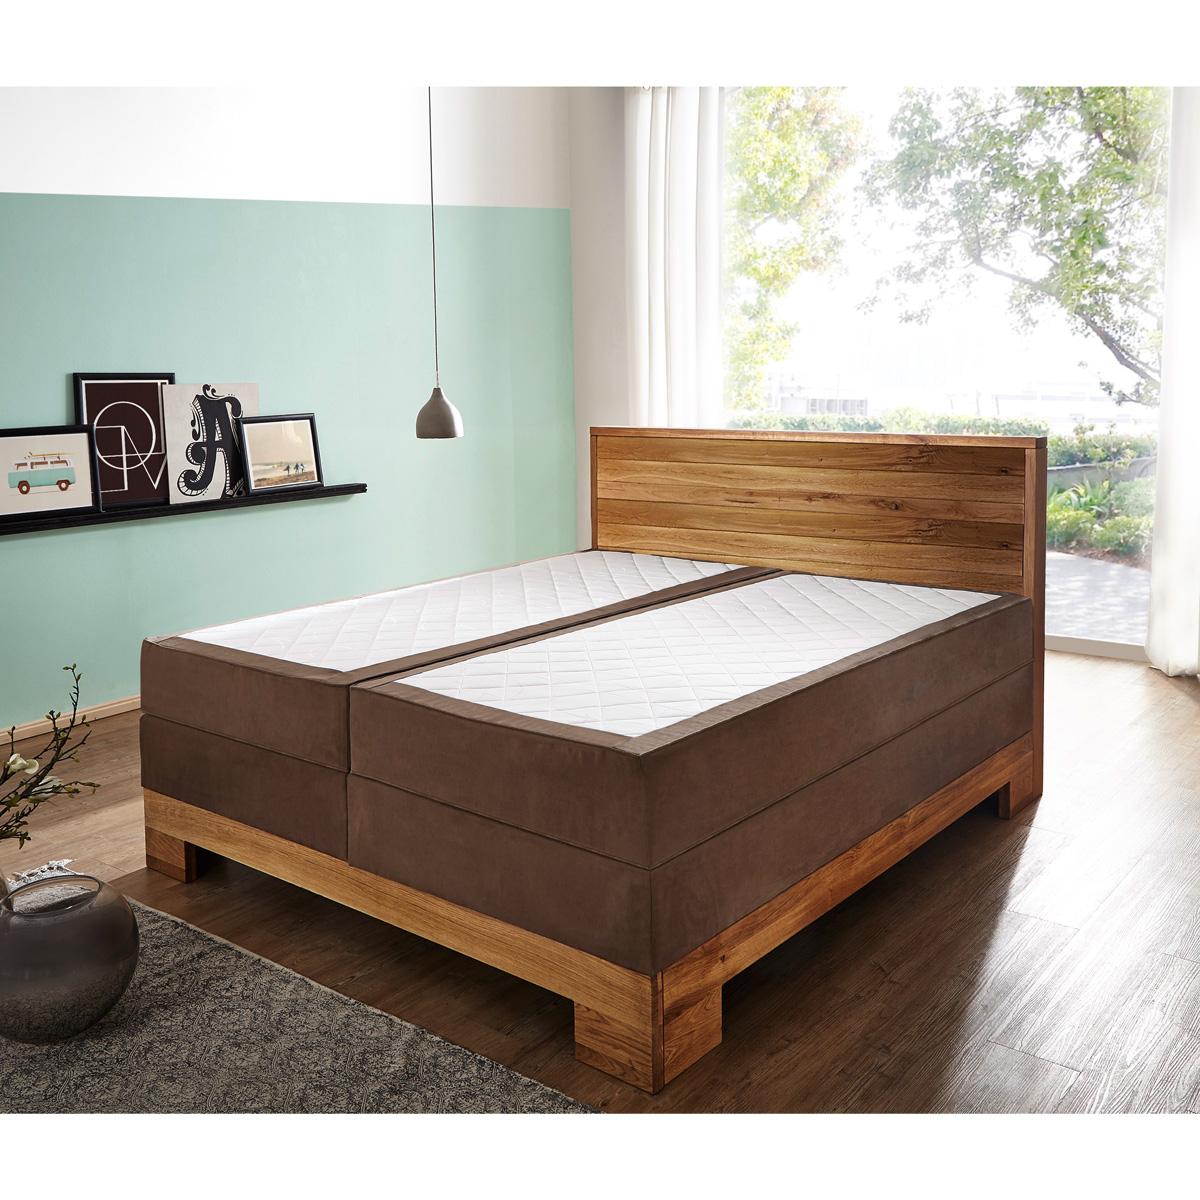 boxspringbett guana doppelbett stoff braun wildeiche massiv 7 zonen ttfk 180x200 eur. Black Bedroom Furniture Sets. Home Design Ideas